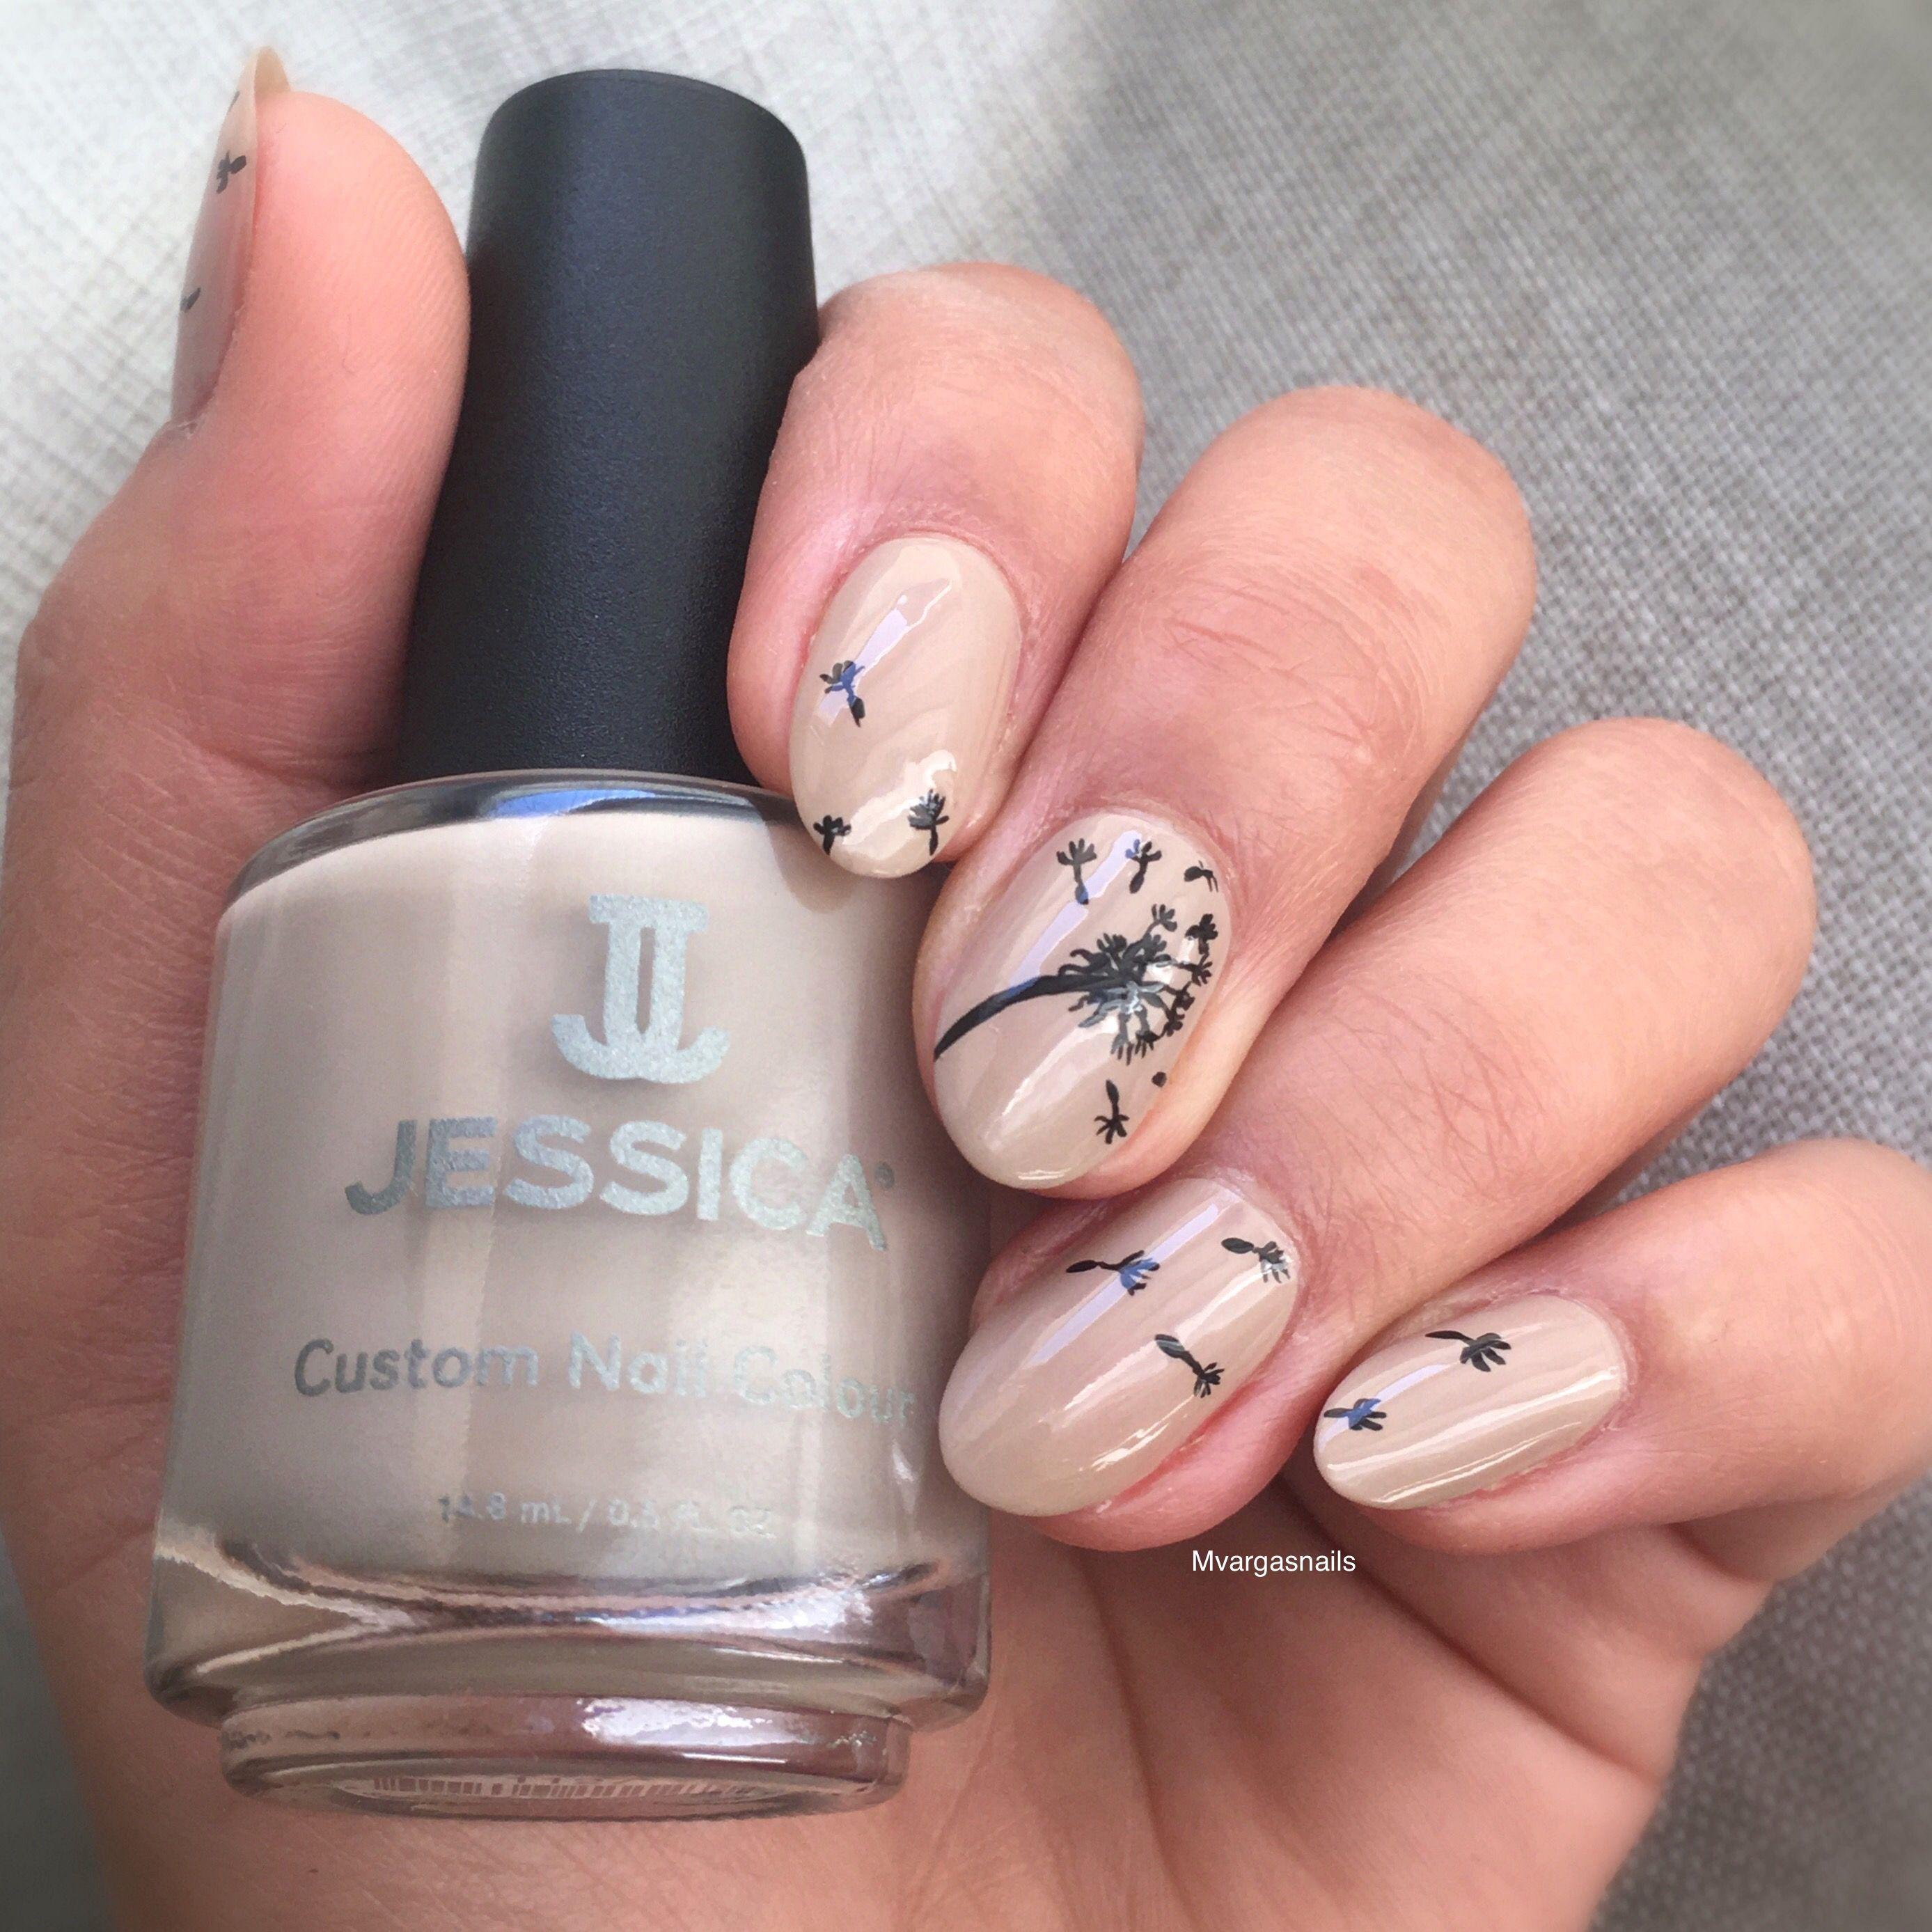 Dandelions nails @jessicacosmetics naked contours | My nail art ( IG ...